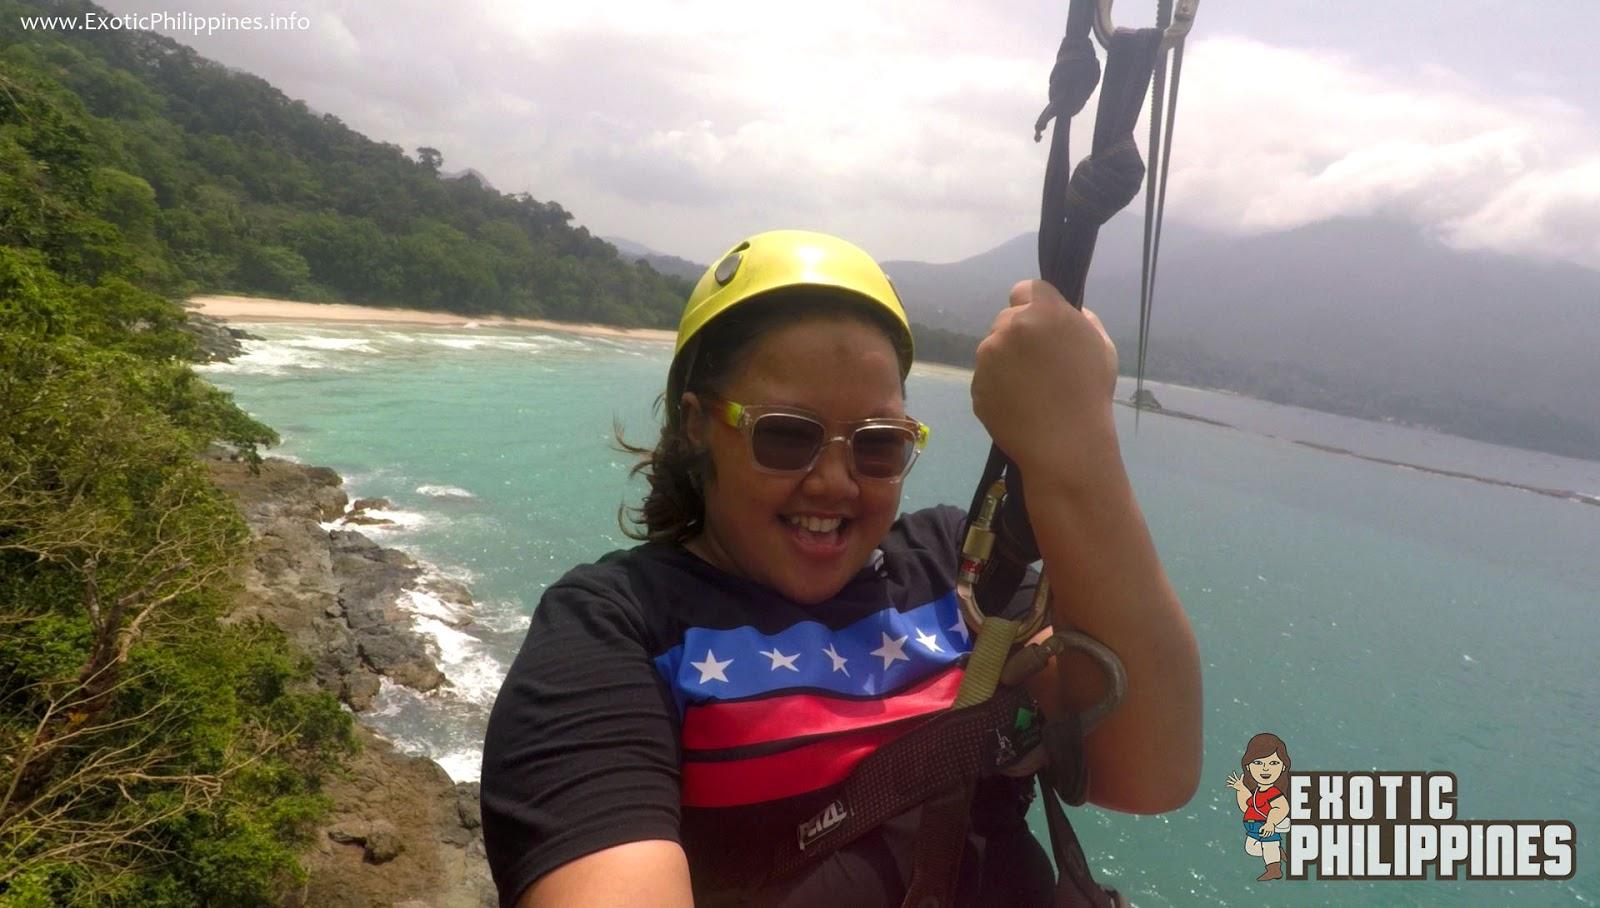 800 Meters Sabang X Zipline Puerto Princesa Palawan G Dumaguing Cebu Travel Blogger Blog Vlog Vlogger Exotic Philippines